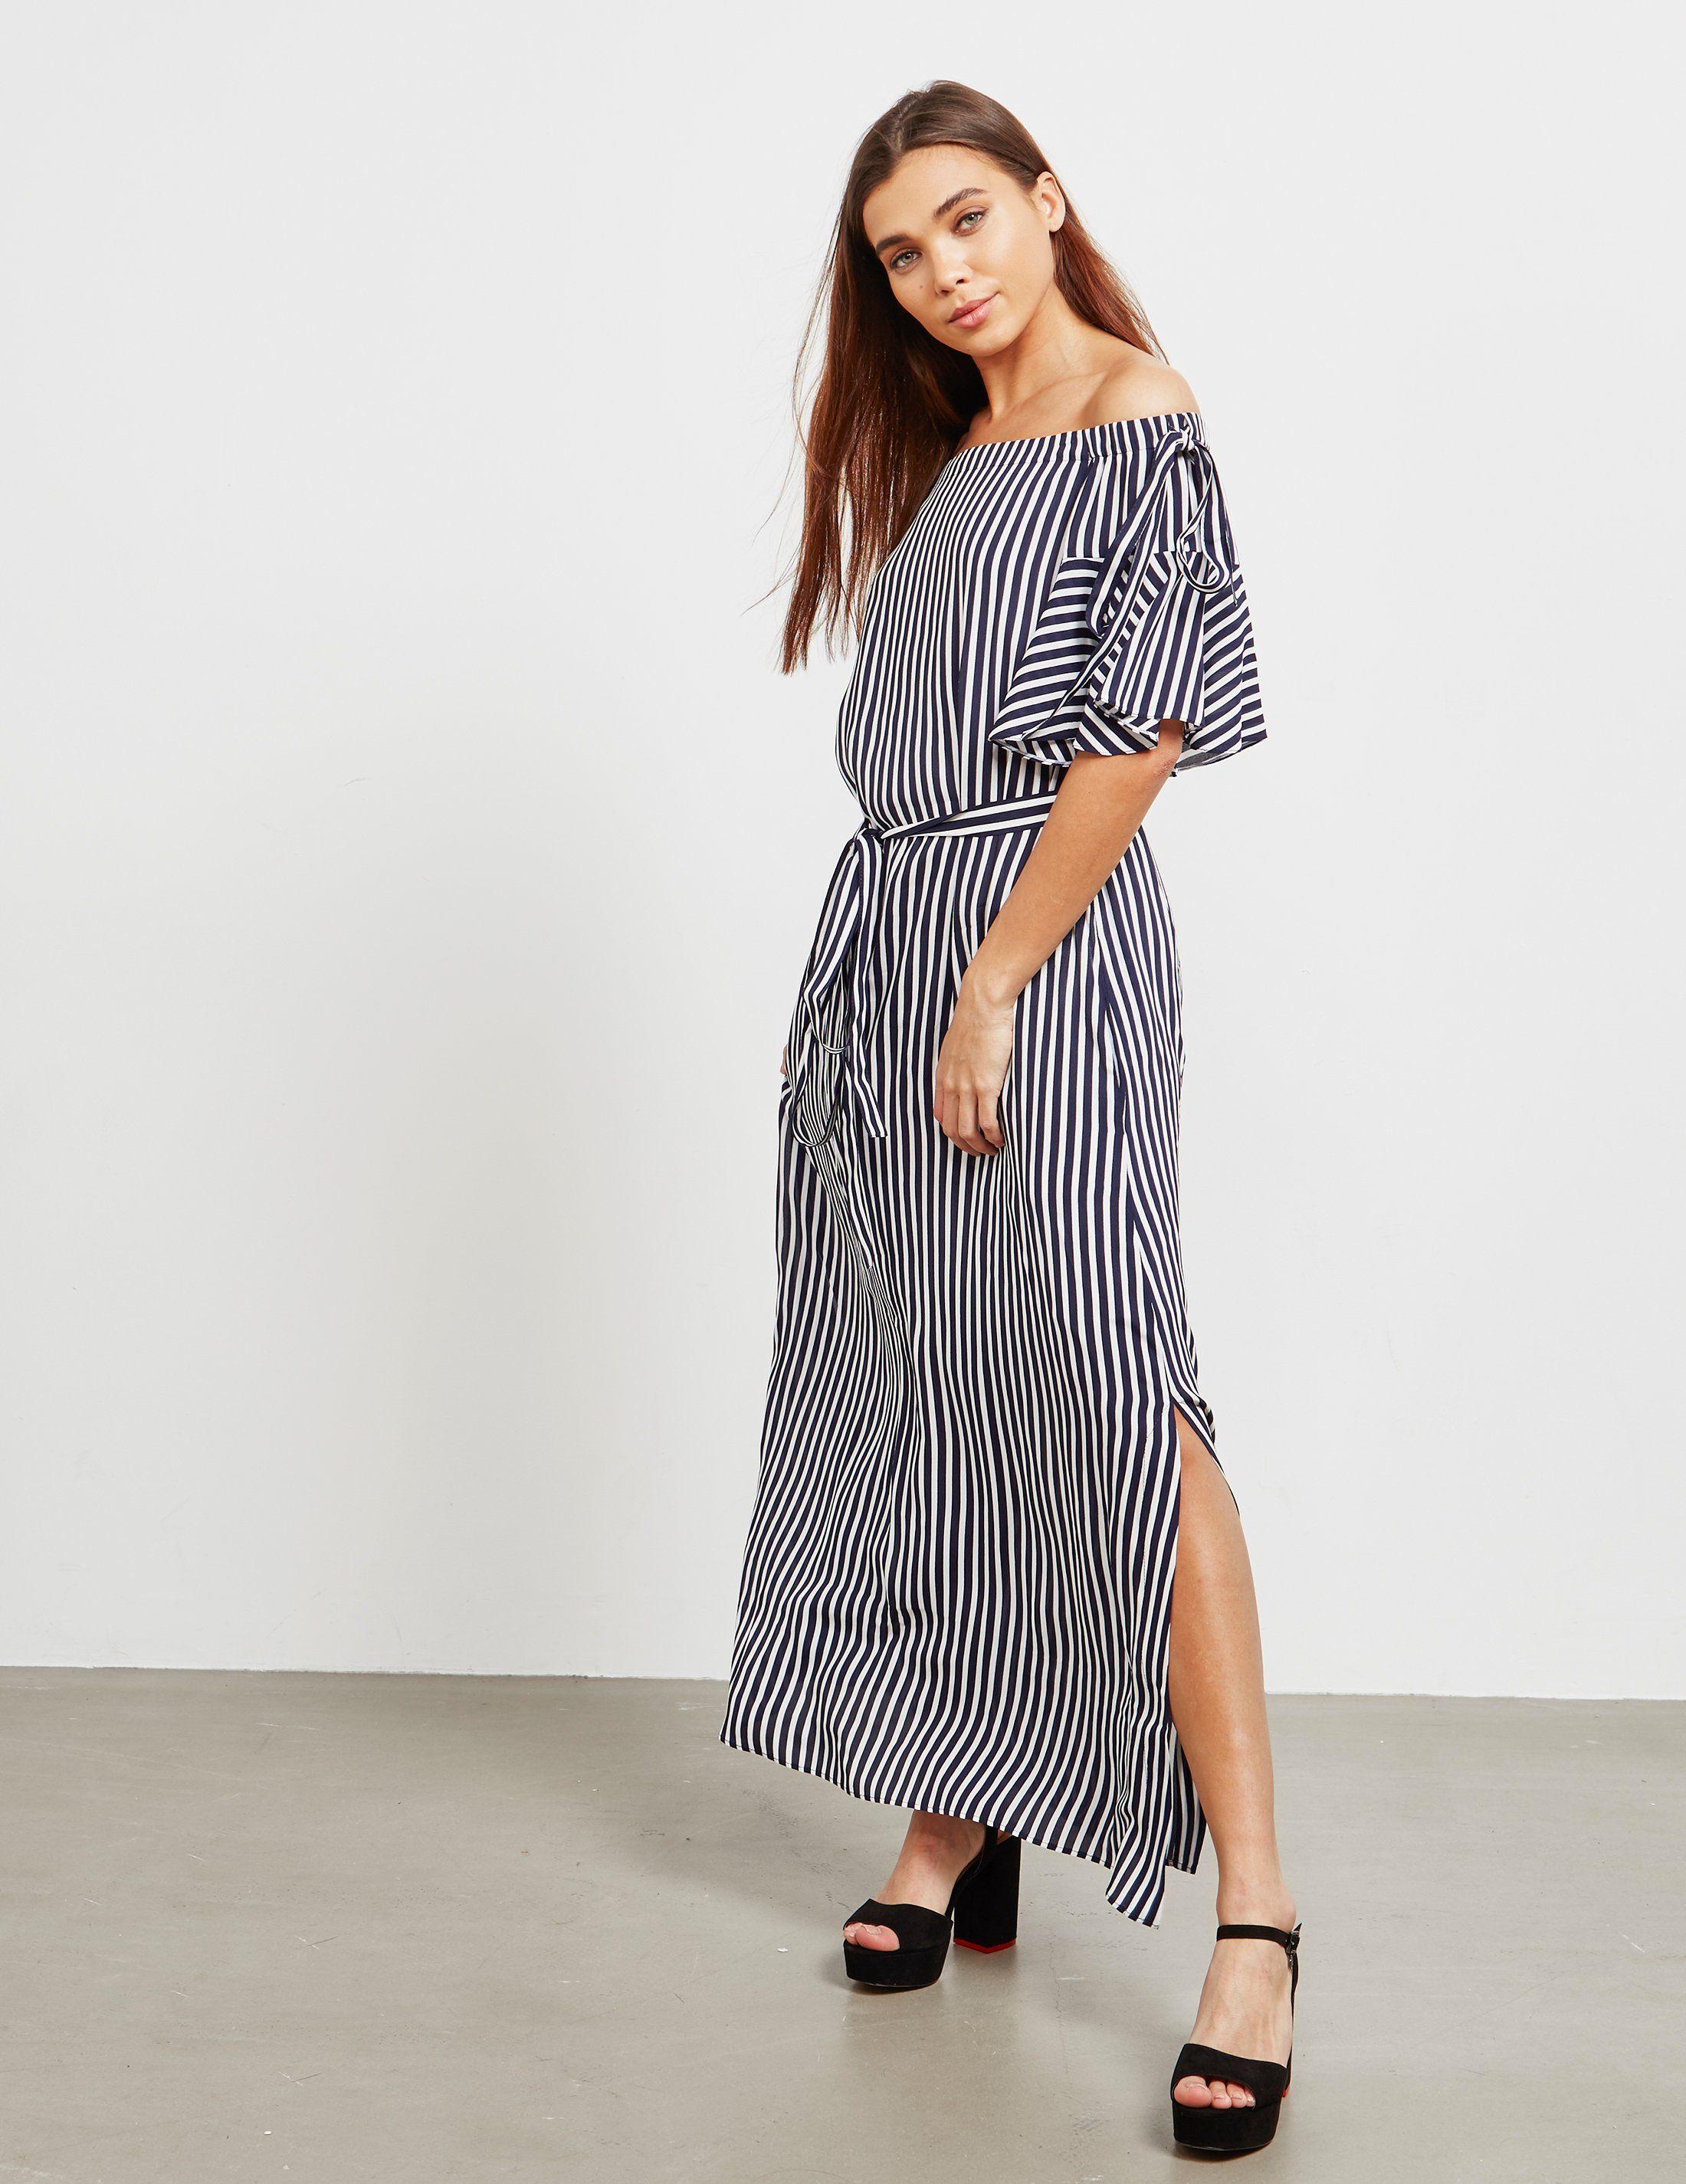 HUGO Kabowy Stripe Dress - Online Exclusive